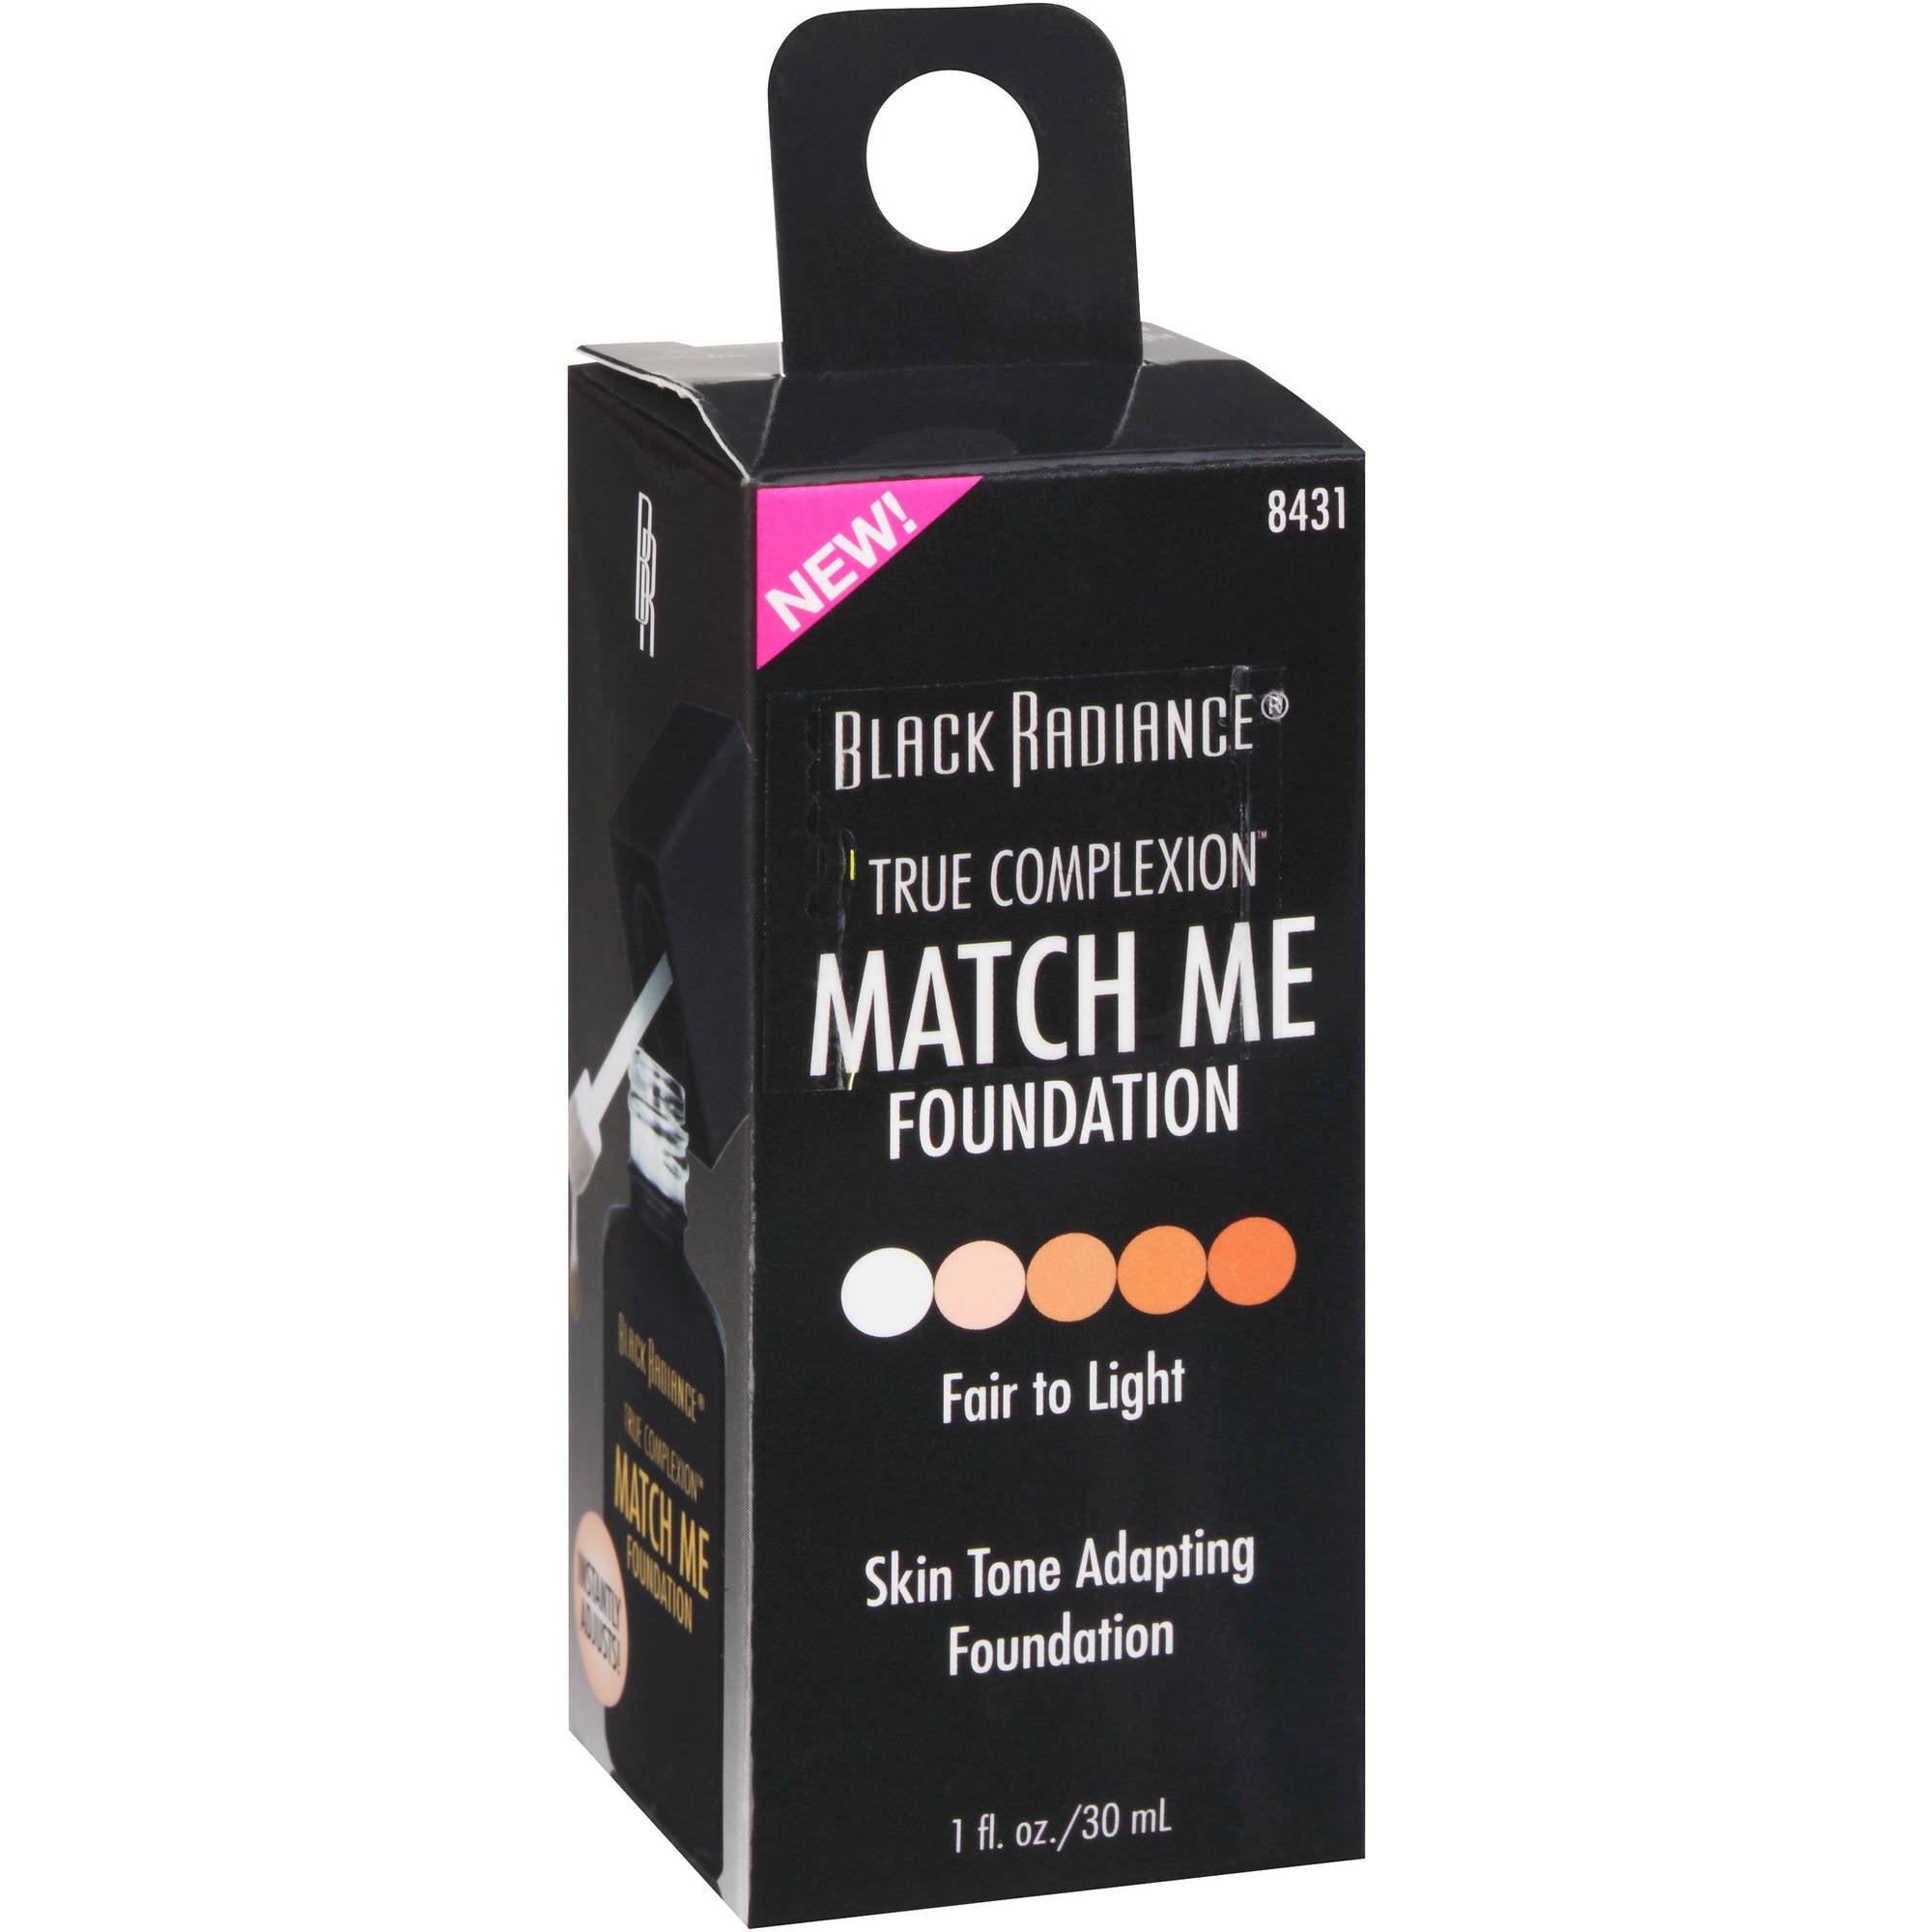 Black Radiance True Complexion Match Me Foundation, 8431 Fair to Light, 1 fl oz